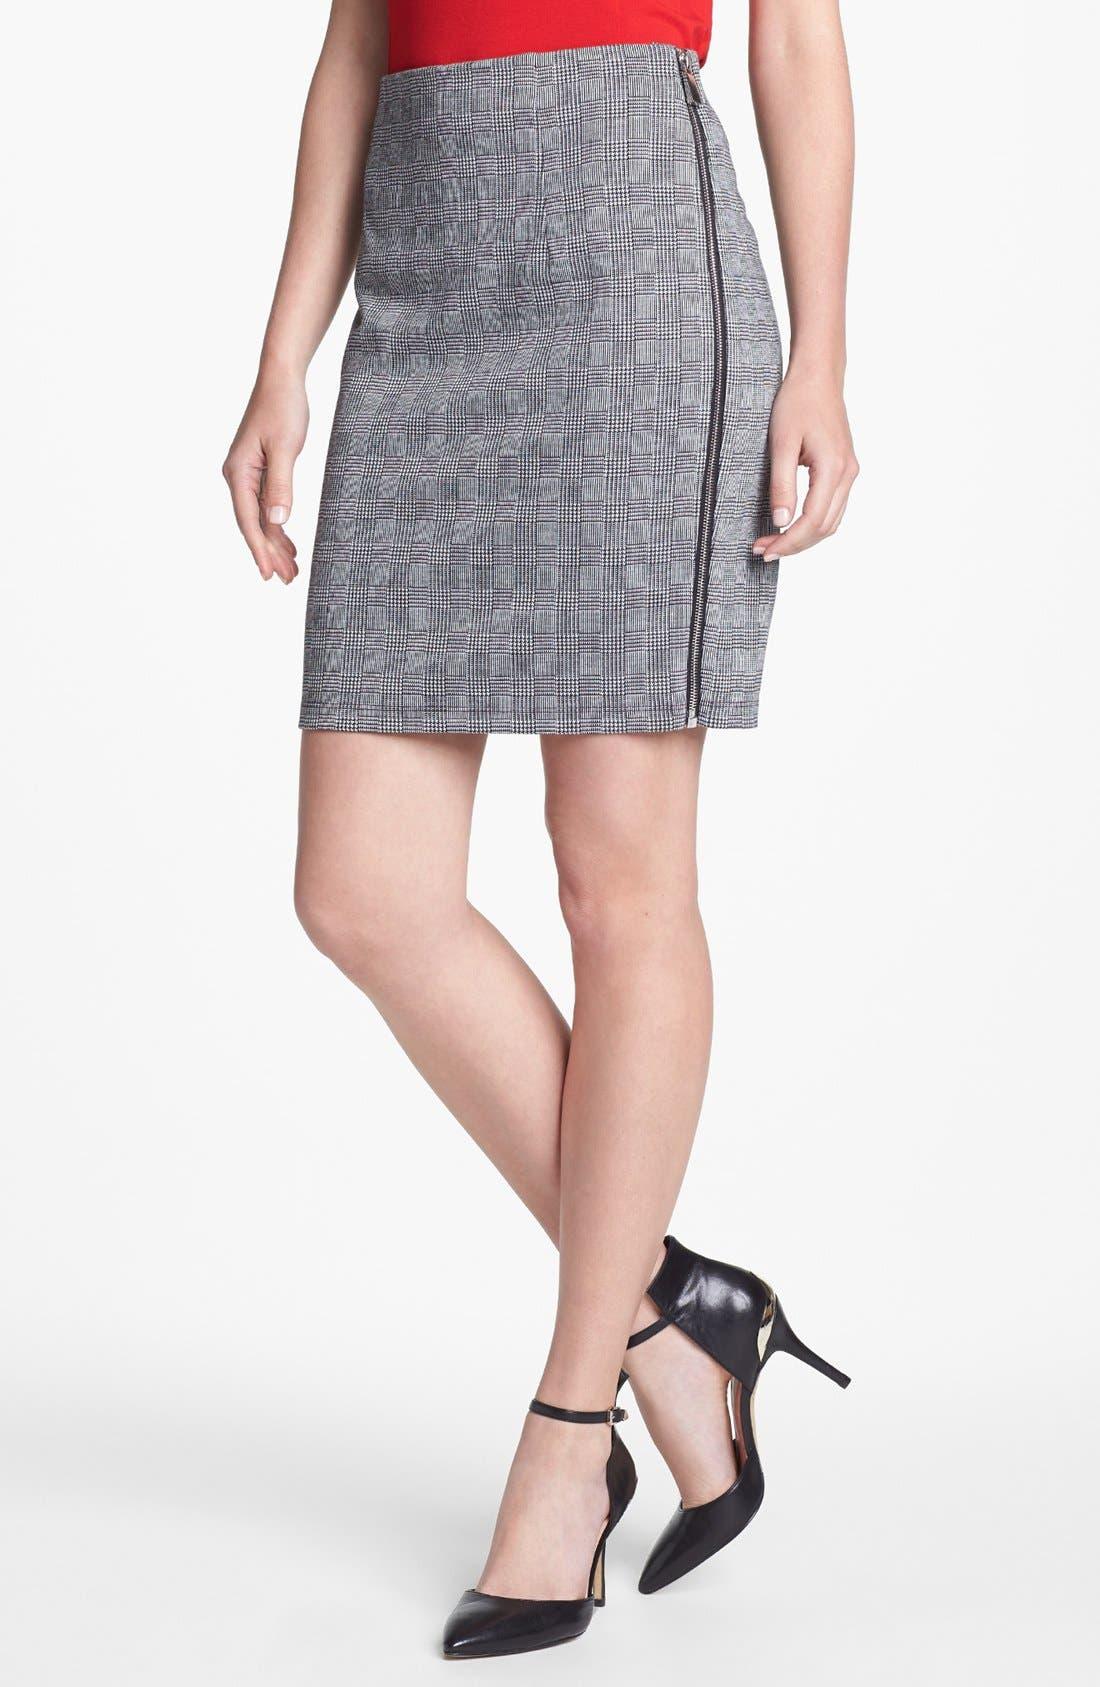 Alternate Image 1 Selected - Vince Camuto Side Zip Glen Plaid Pencil Skirt (Nordstrom Exclusive)